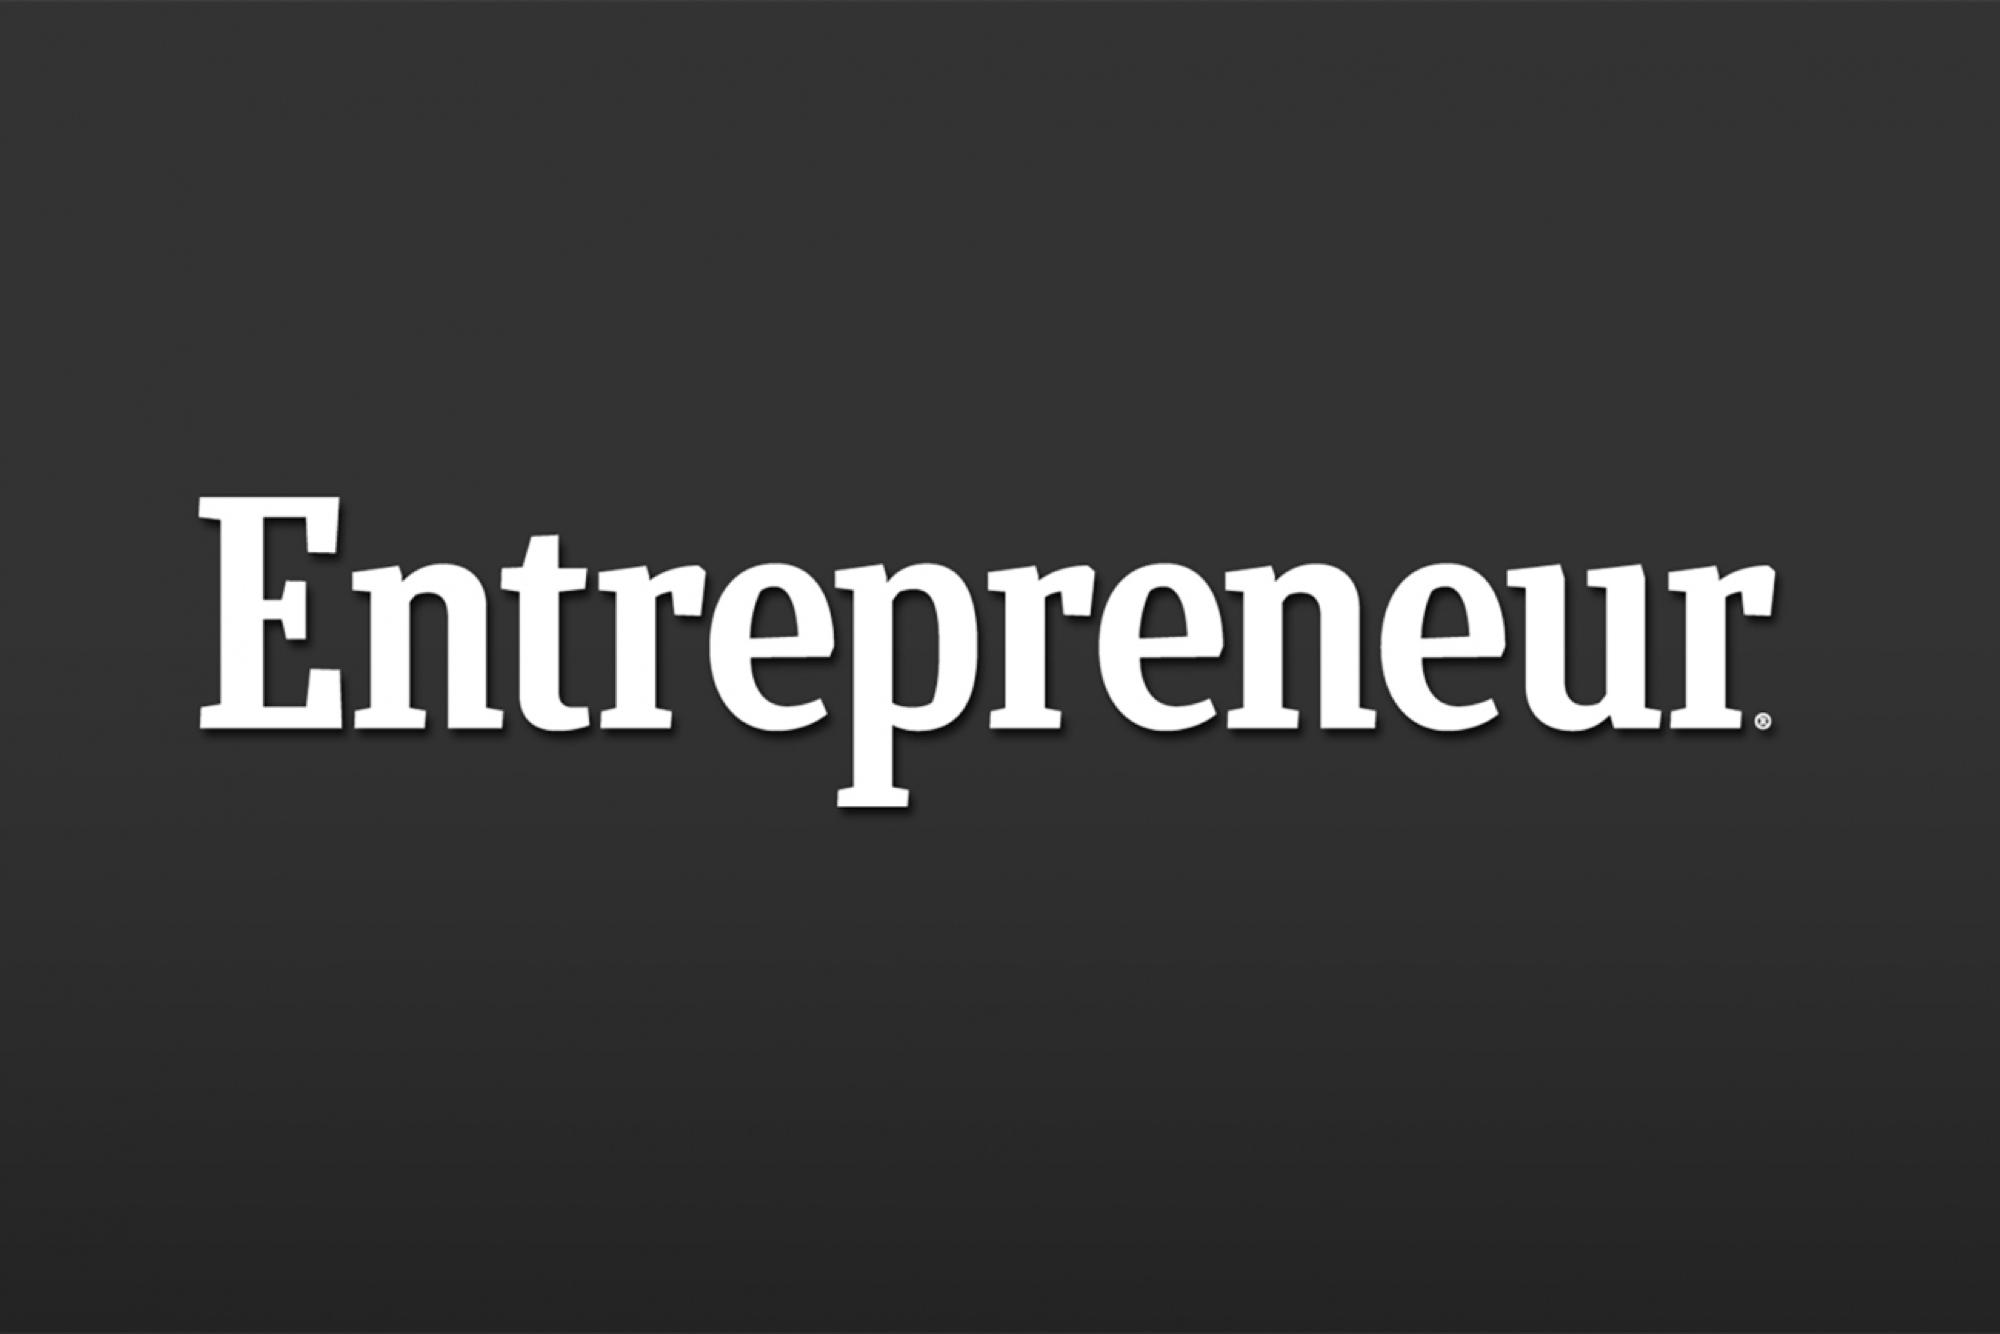 The 360 Best Entrepreneurial Companies in America